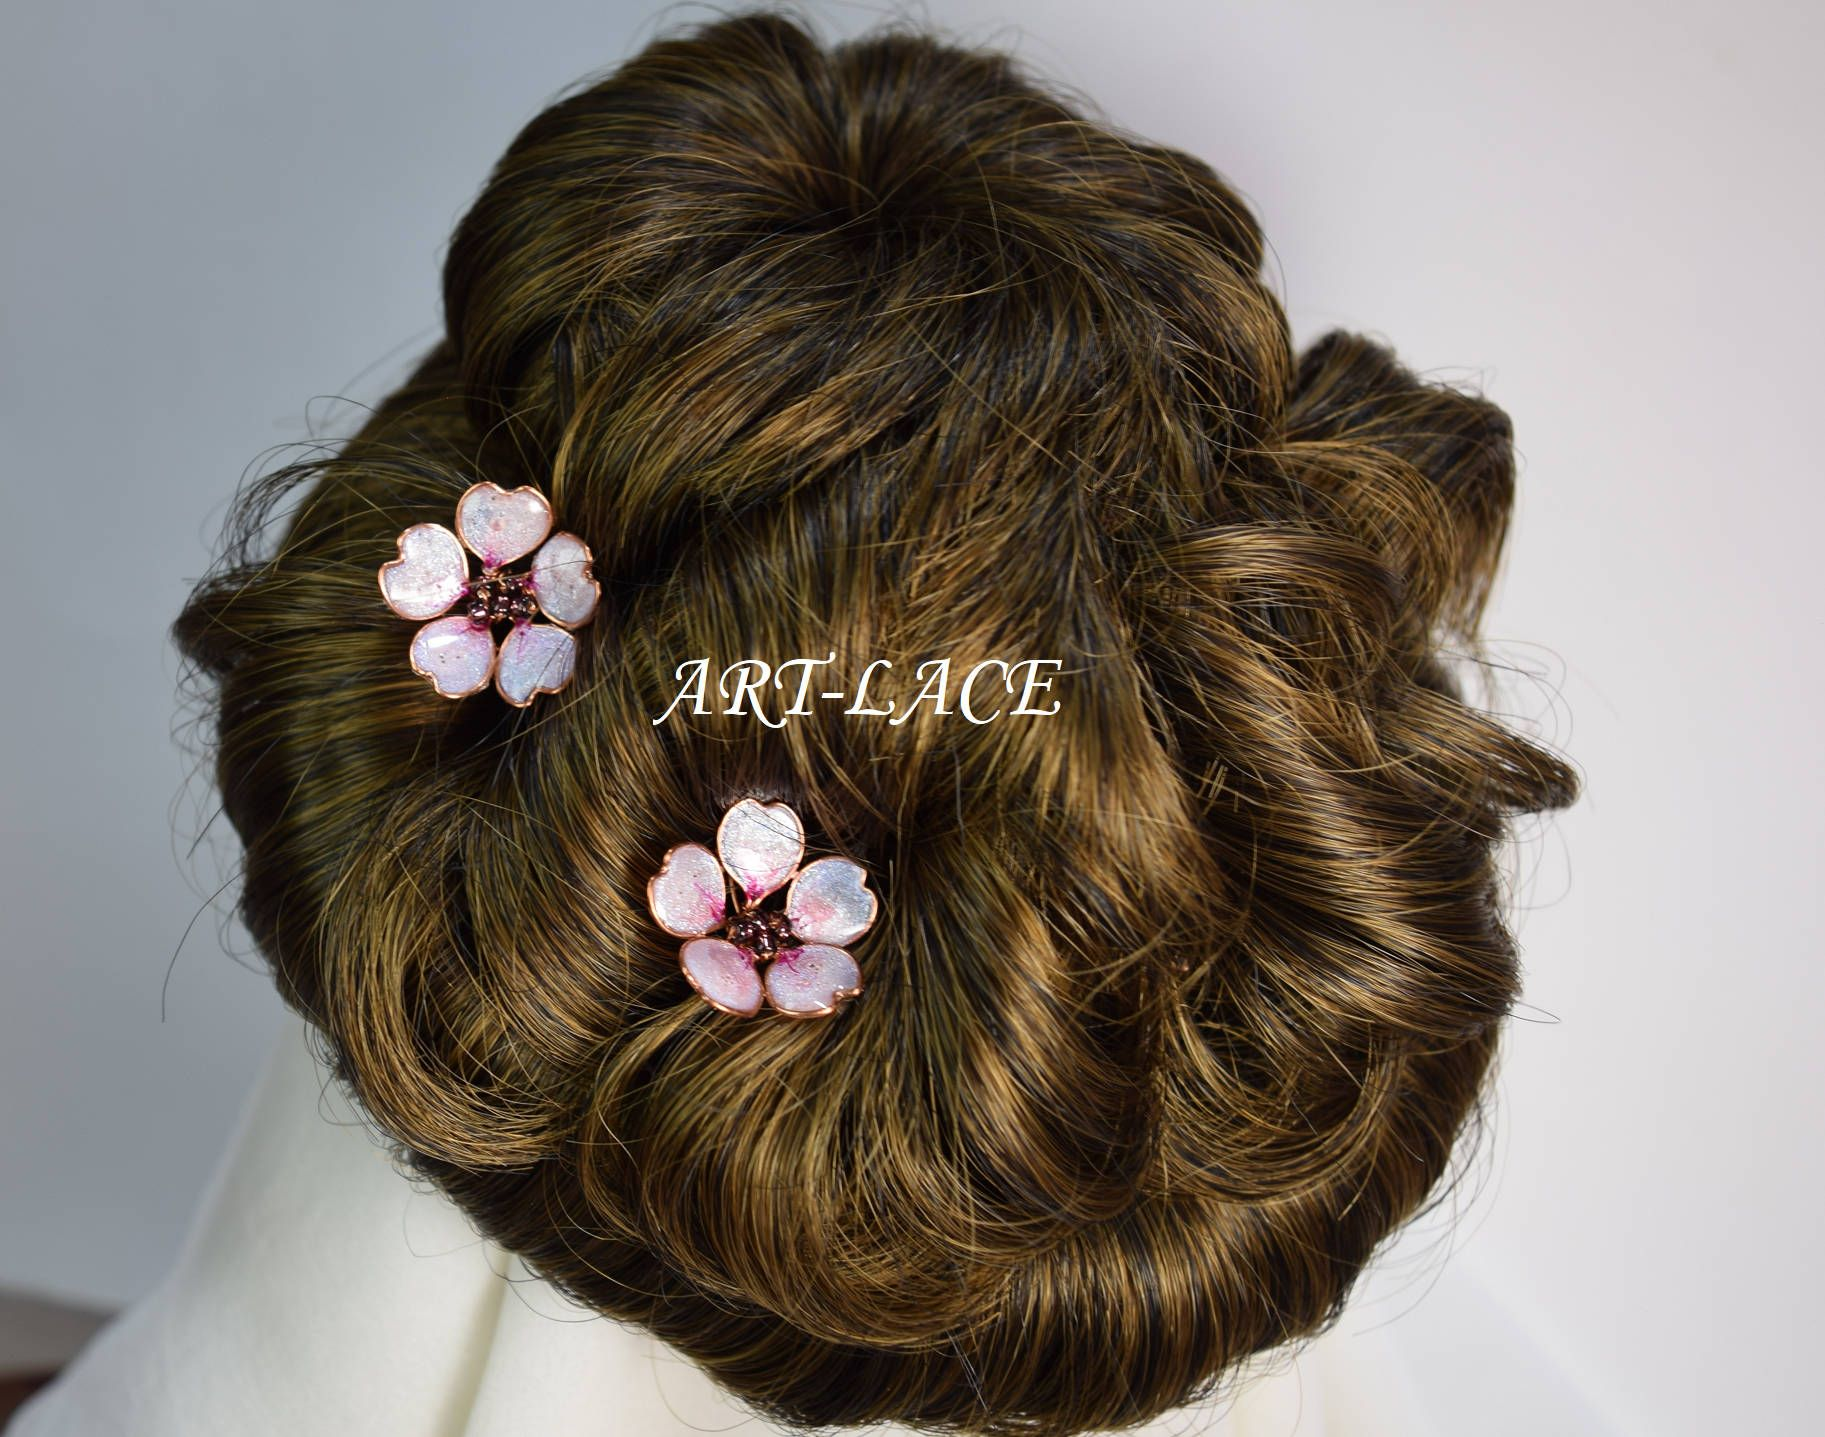 sakura hair pin rose gold hair accessories for women cherry